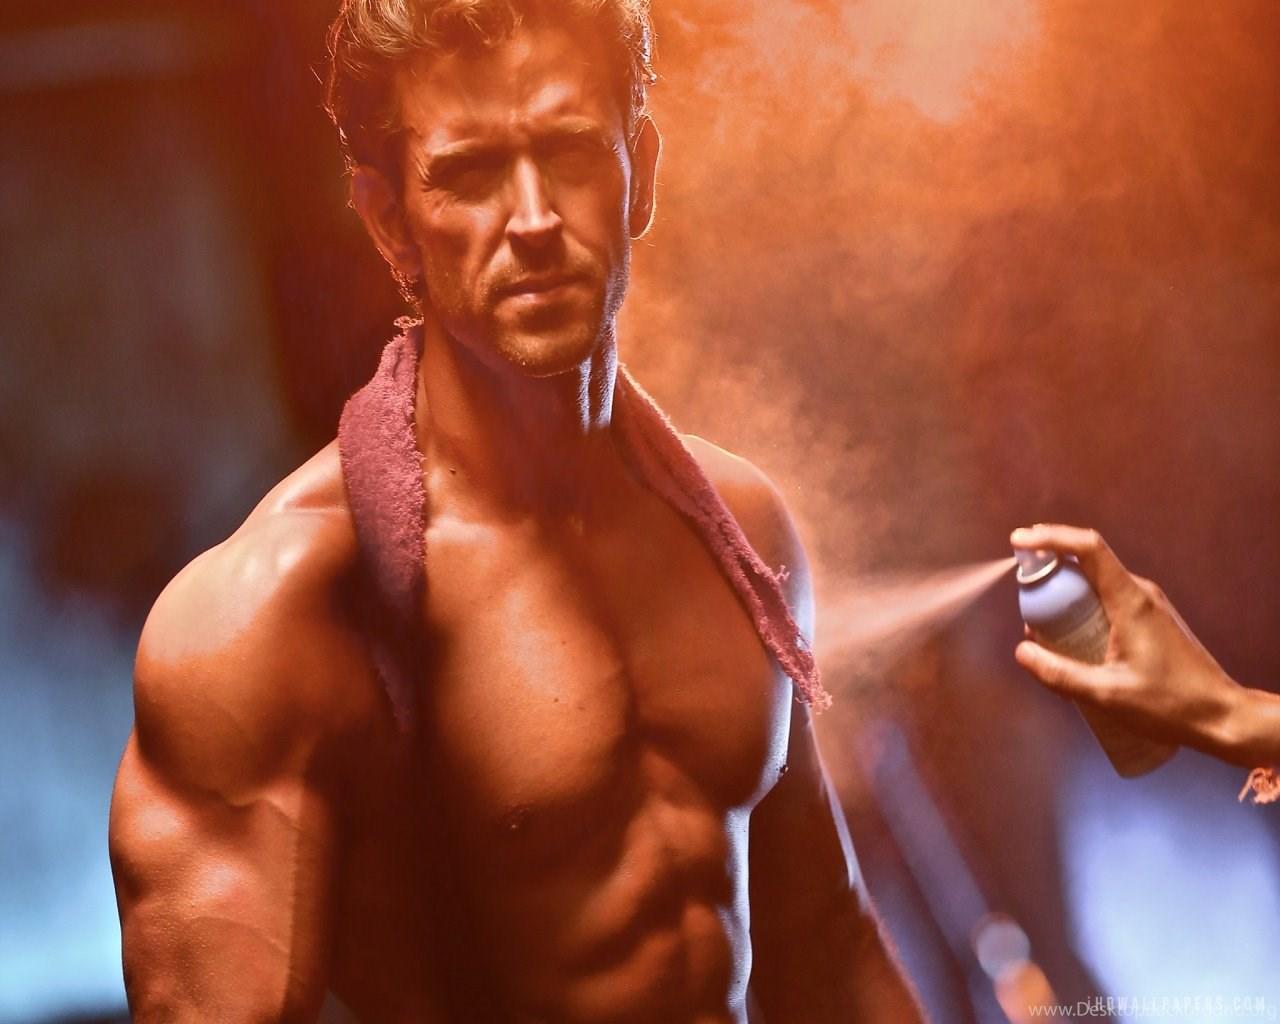 New Popular Actor Varun Dhawan Six Pack Abs Body Photo Desktop